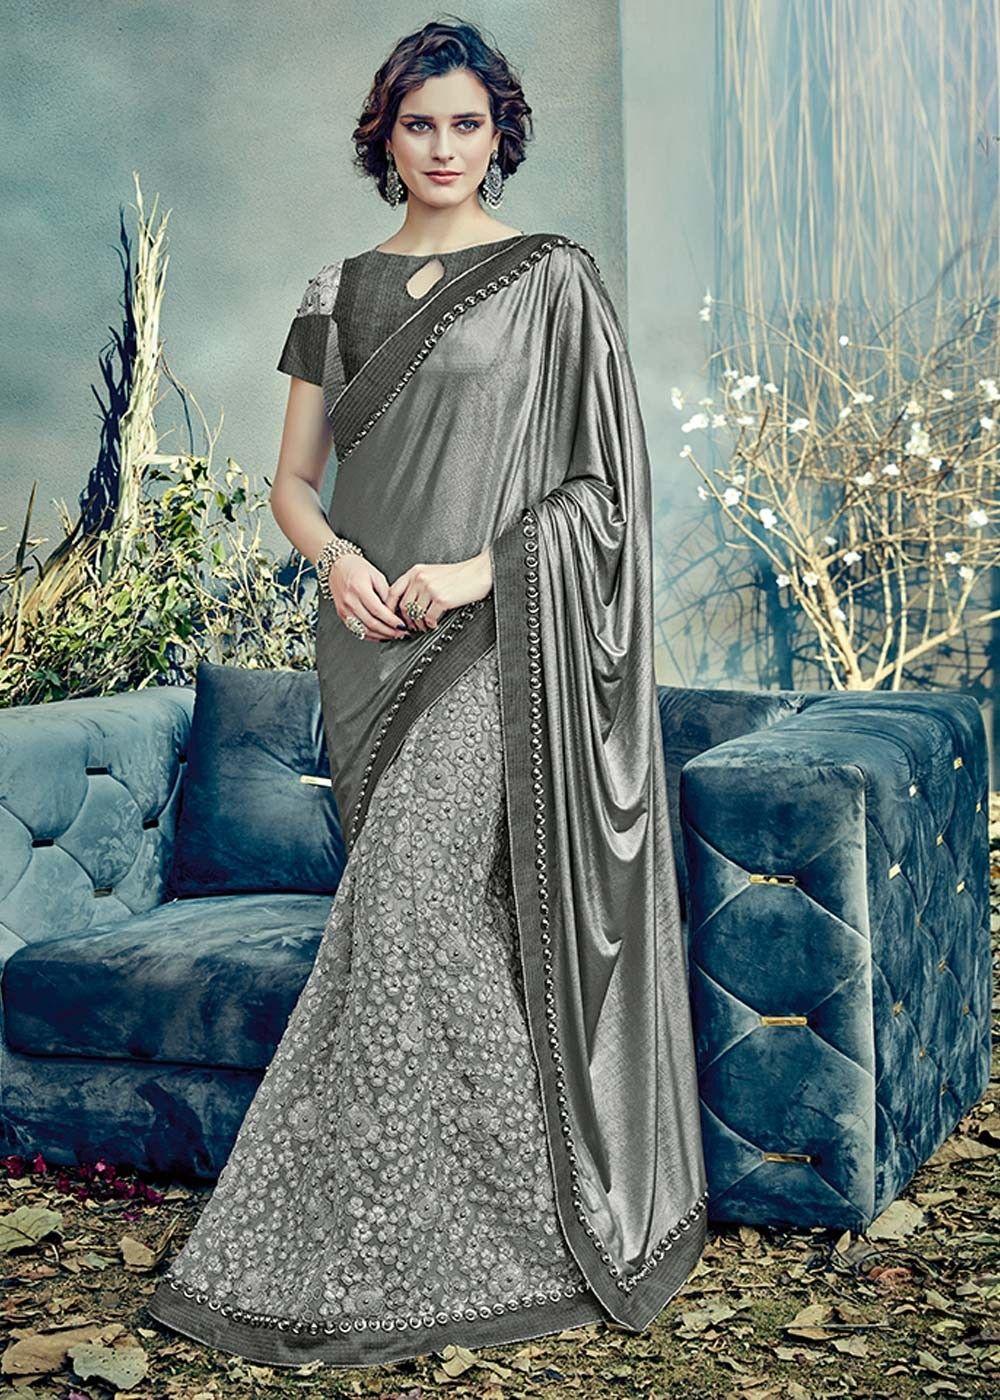 48a9af5f636ebf Indian Latest Bridal Lehenga Saree Designs 2018-2019 | Saree n ...